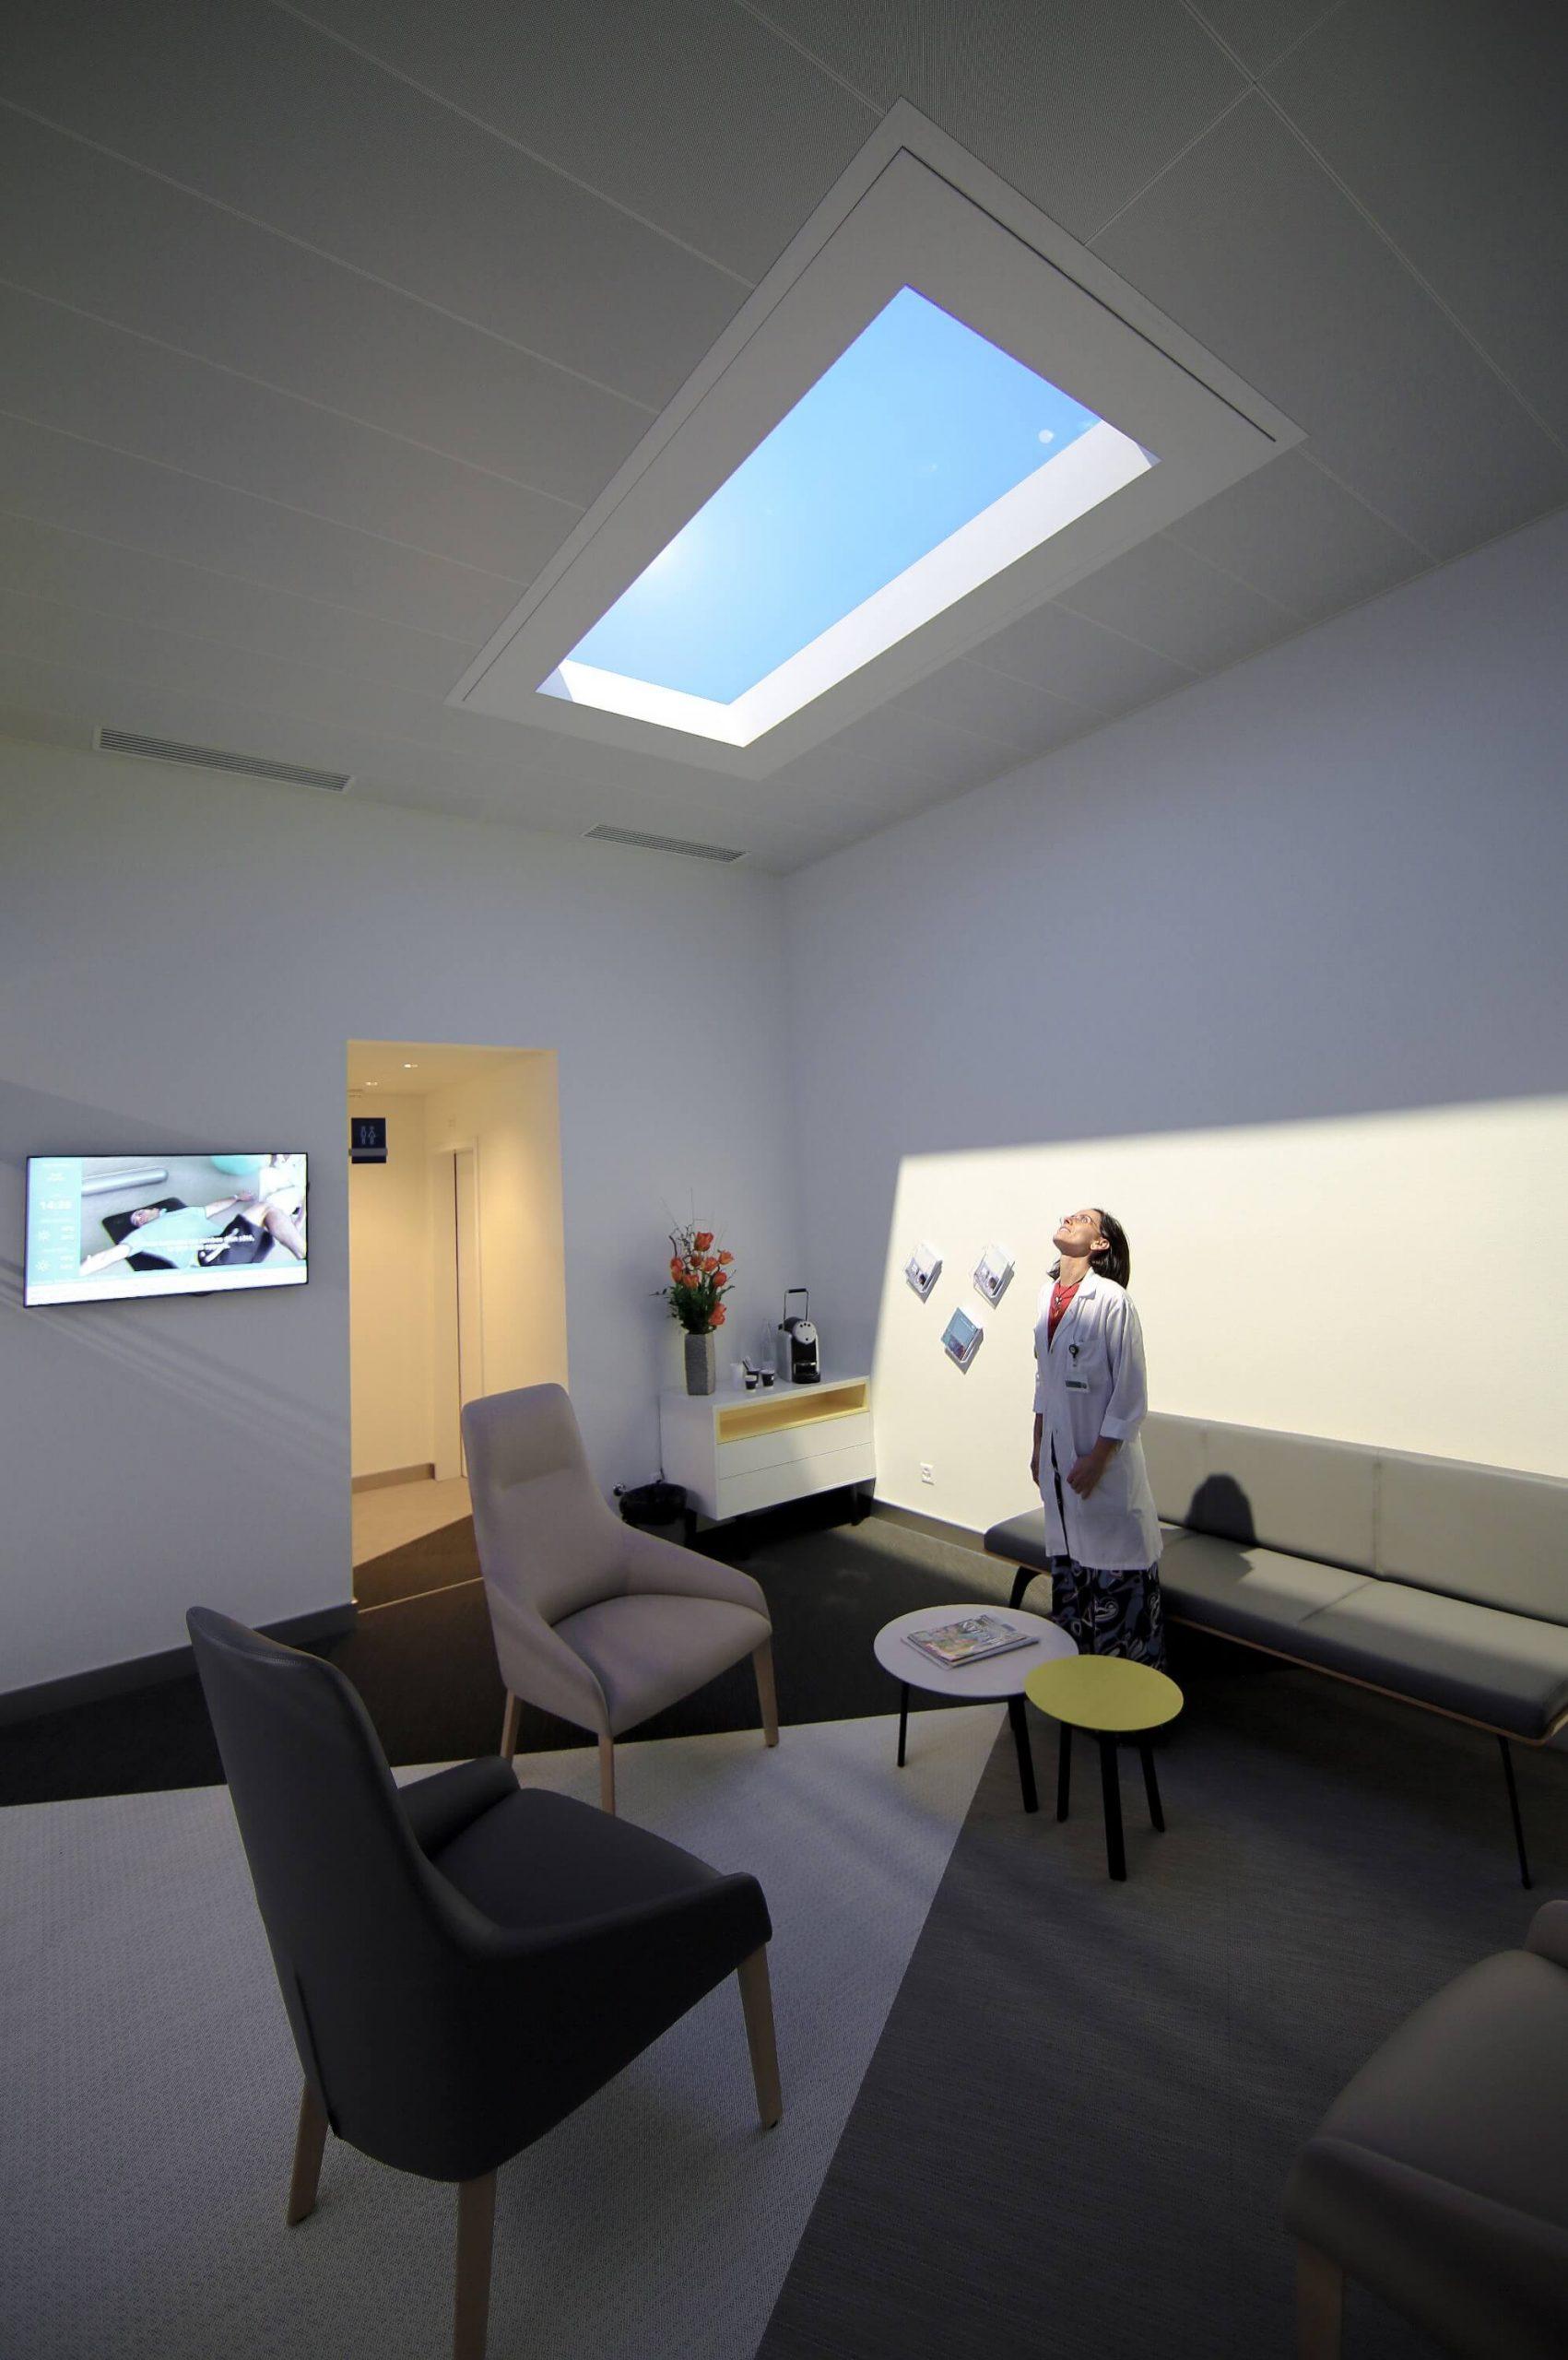 Virtual Sun Light for Healthcare